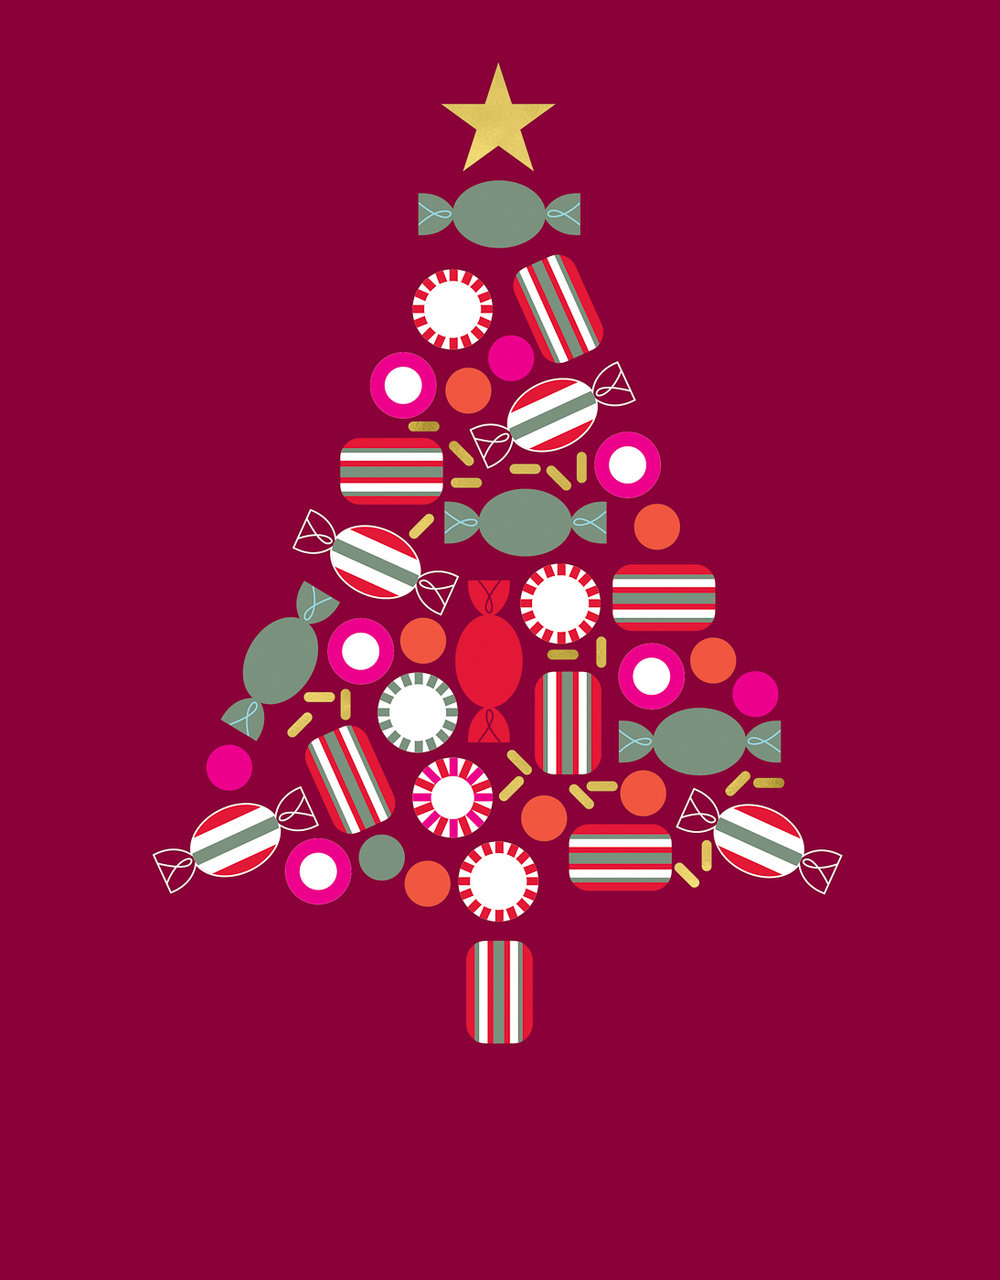 Christmas Tree - Guideposts